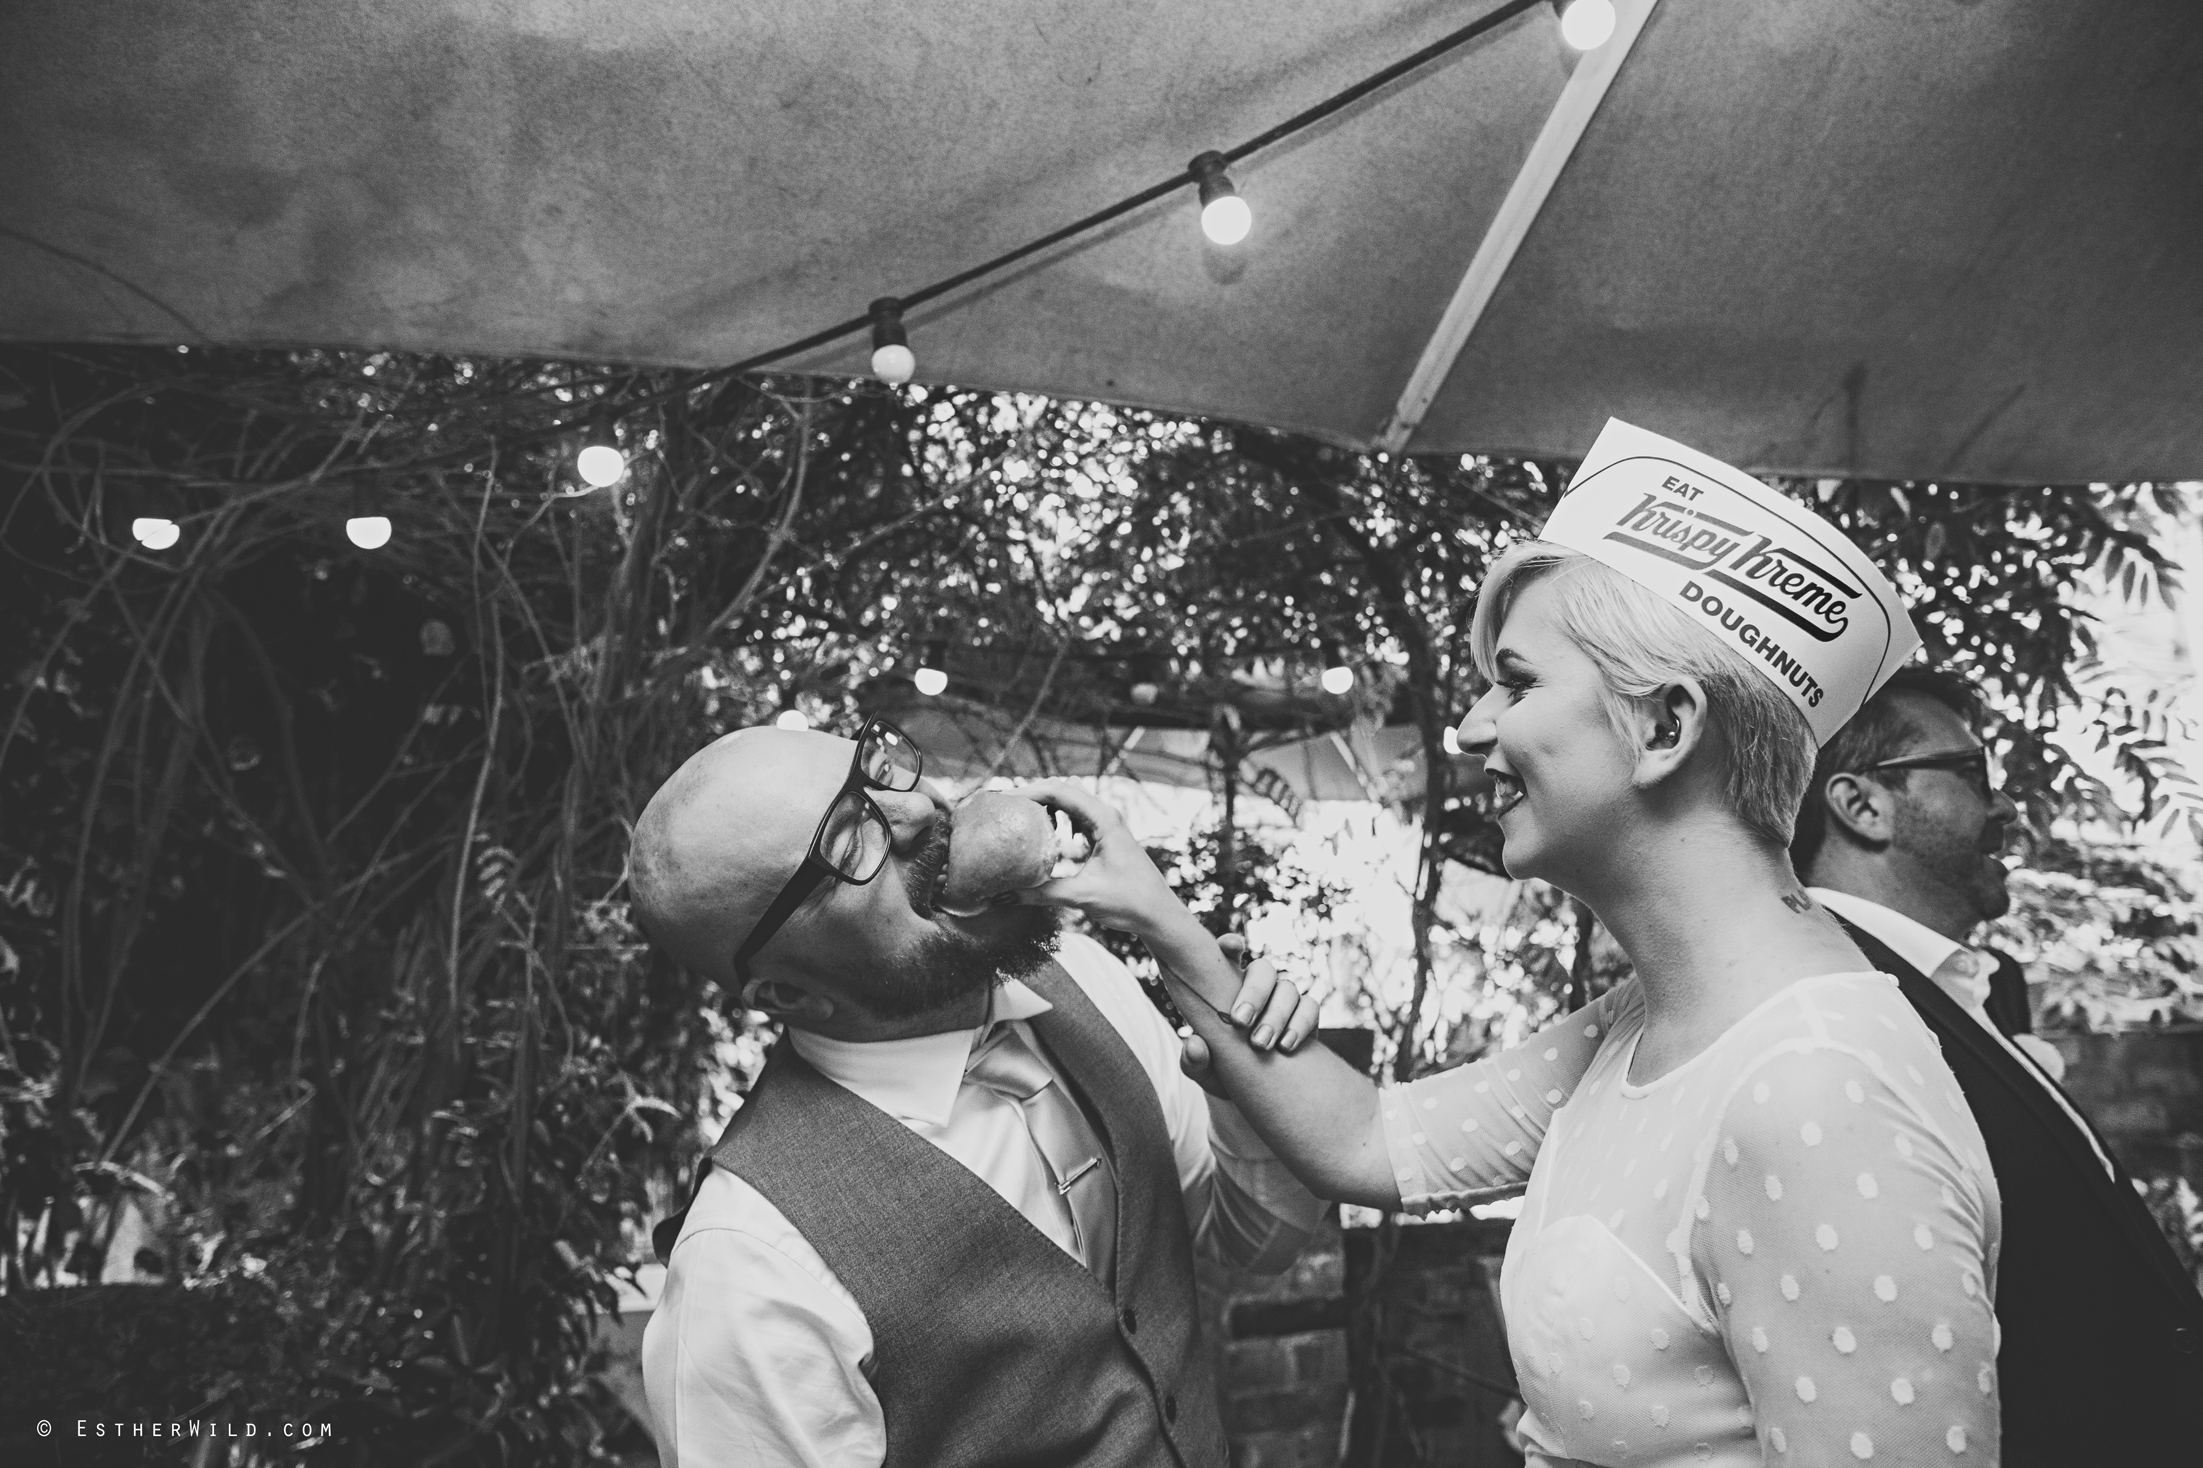 0617_London_Croydon_Clapham_Wedding_Photographer_Esther_Wild_Photography_IMG_6926-1.jpg